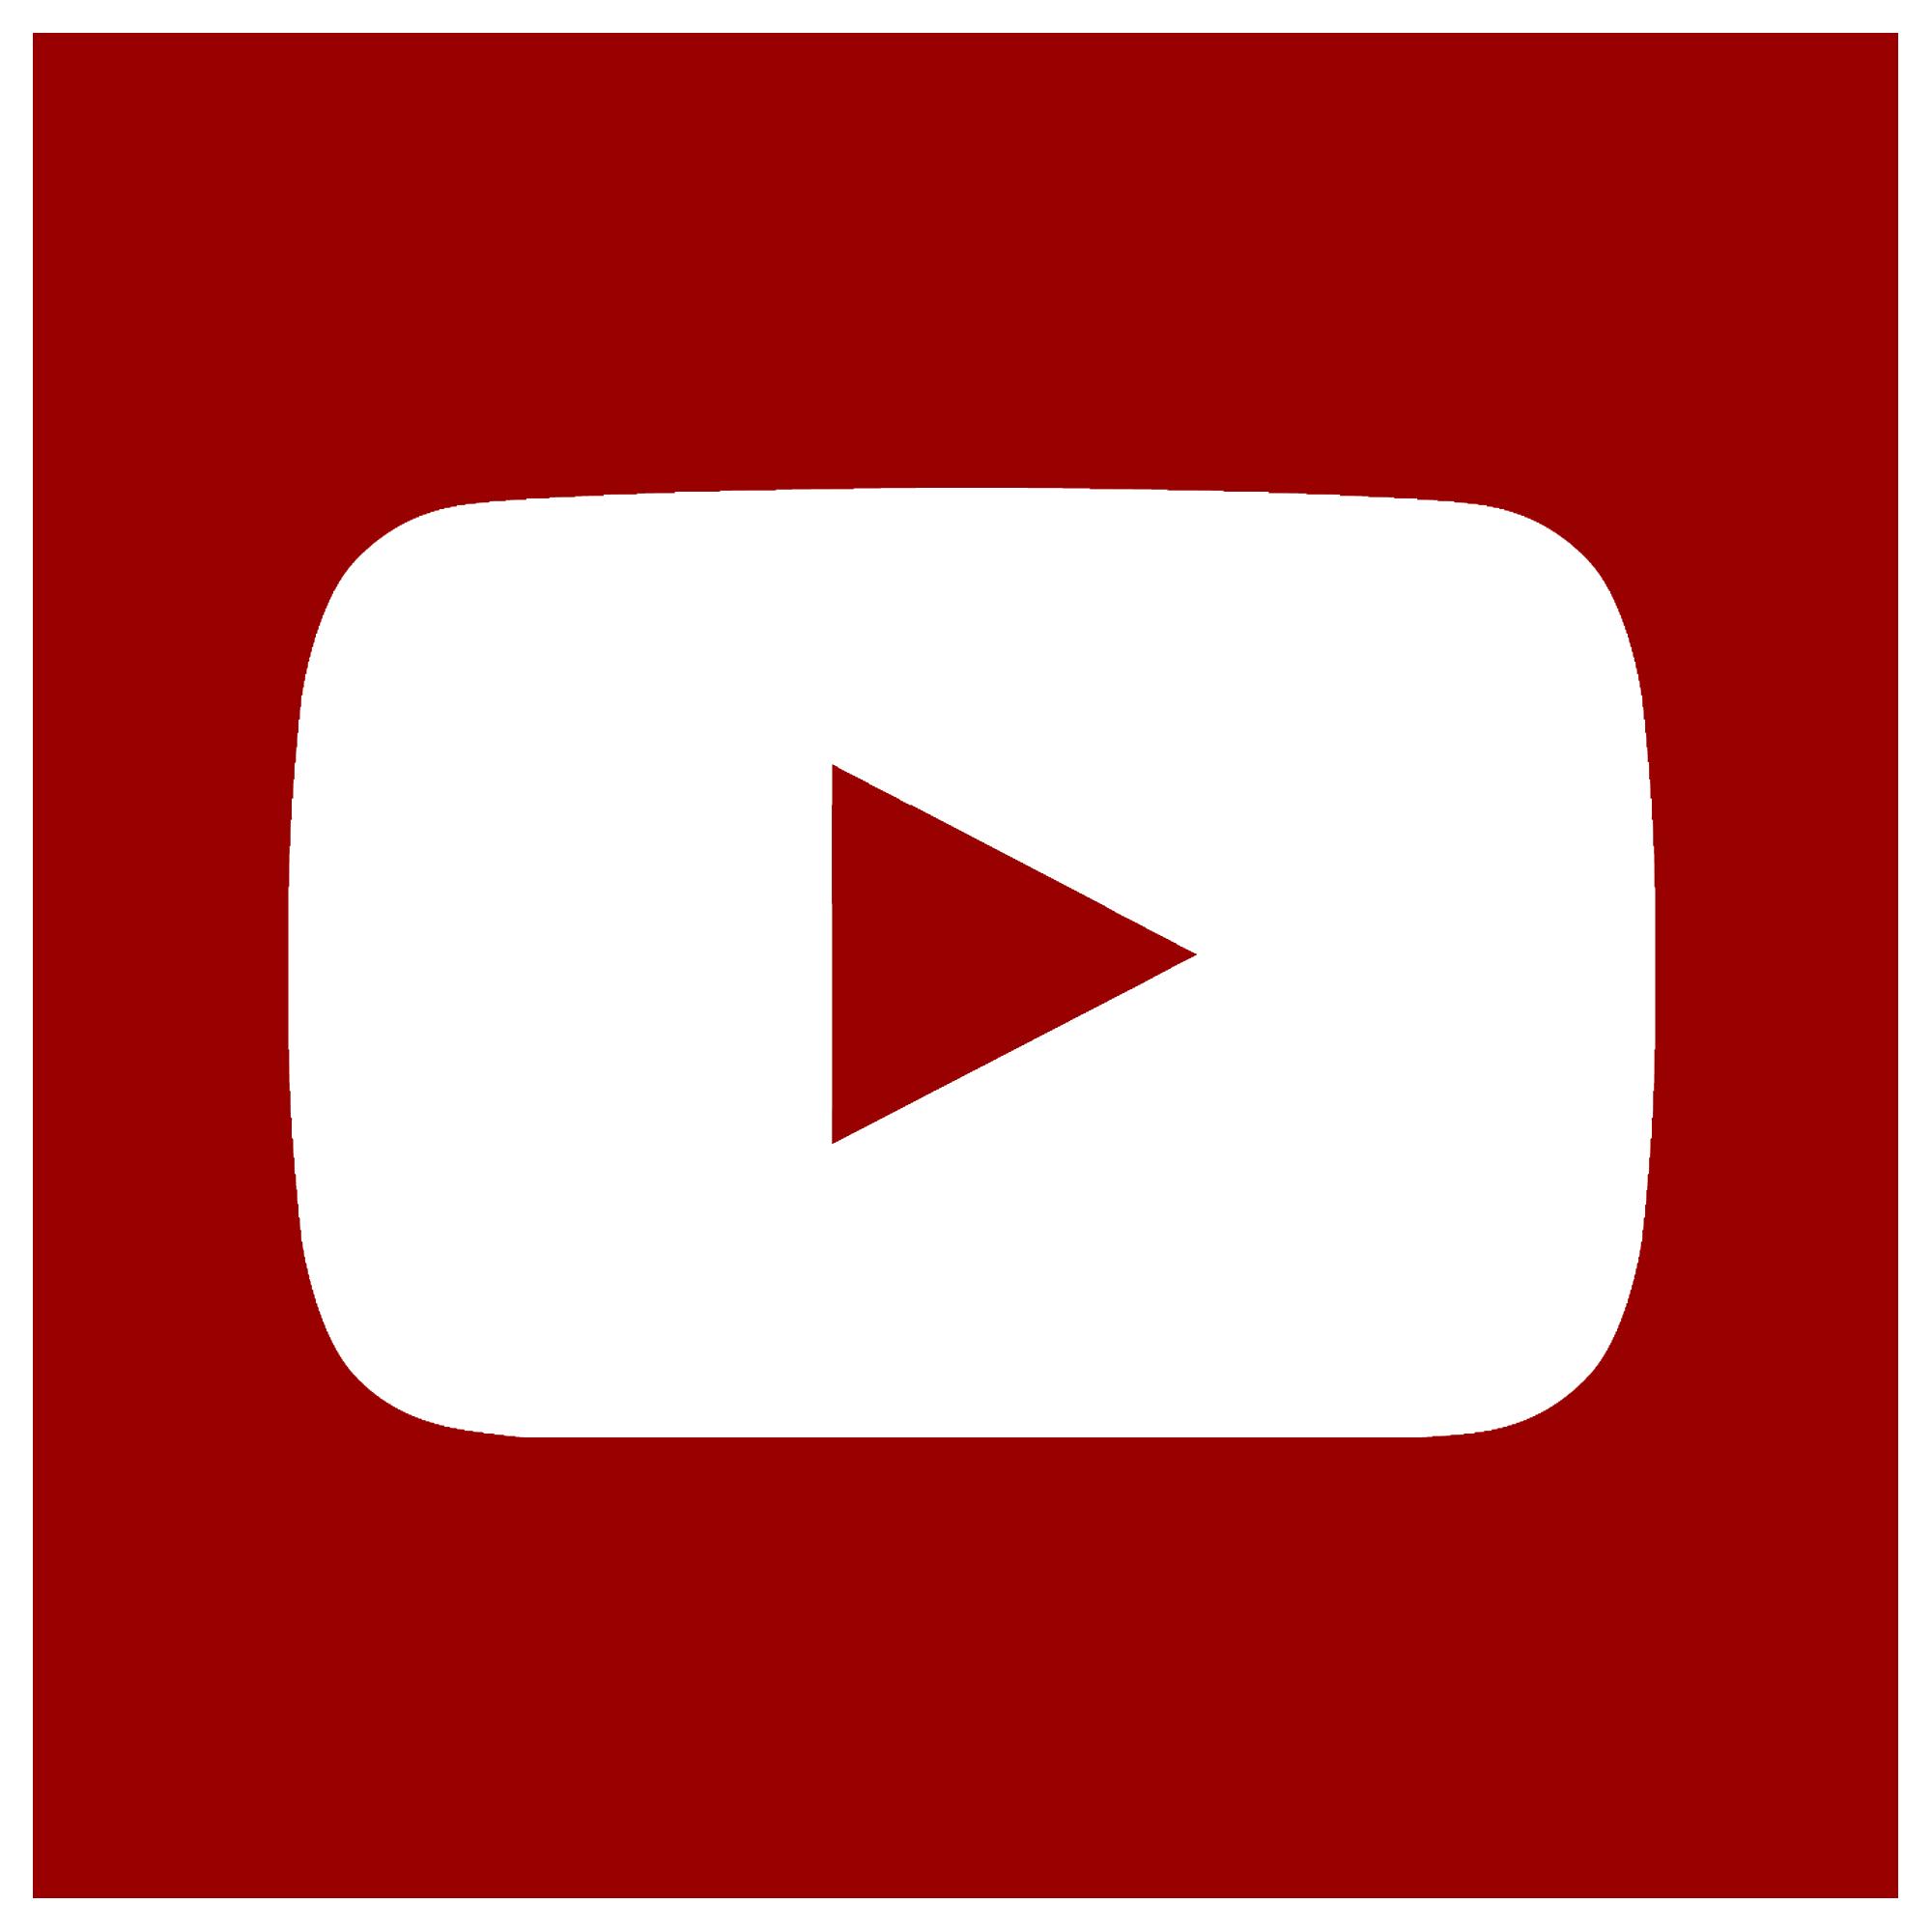 Youtube-logo-red